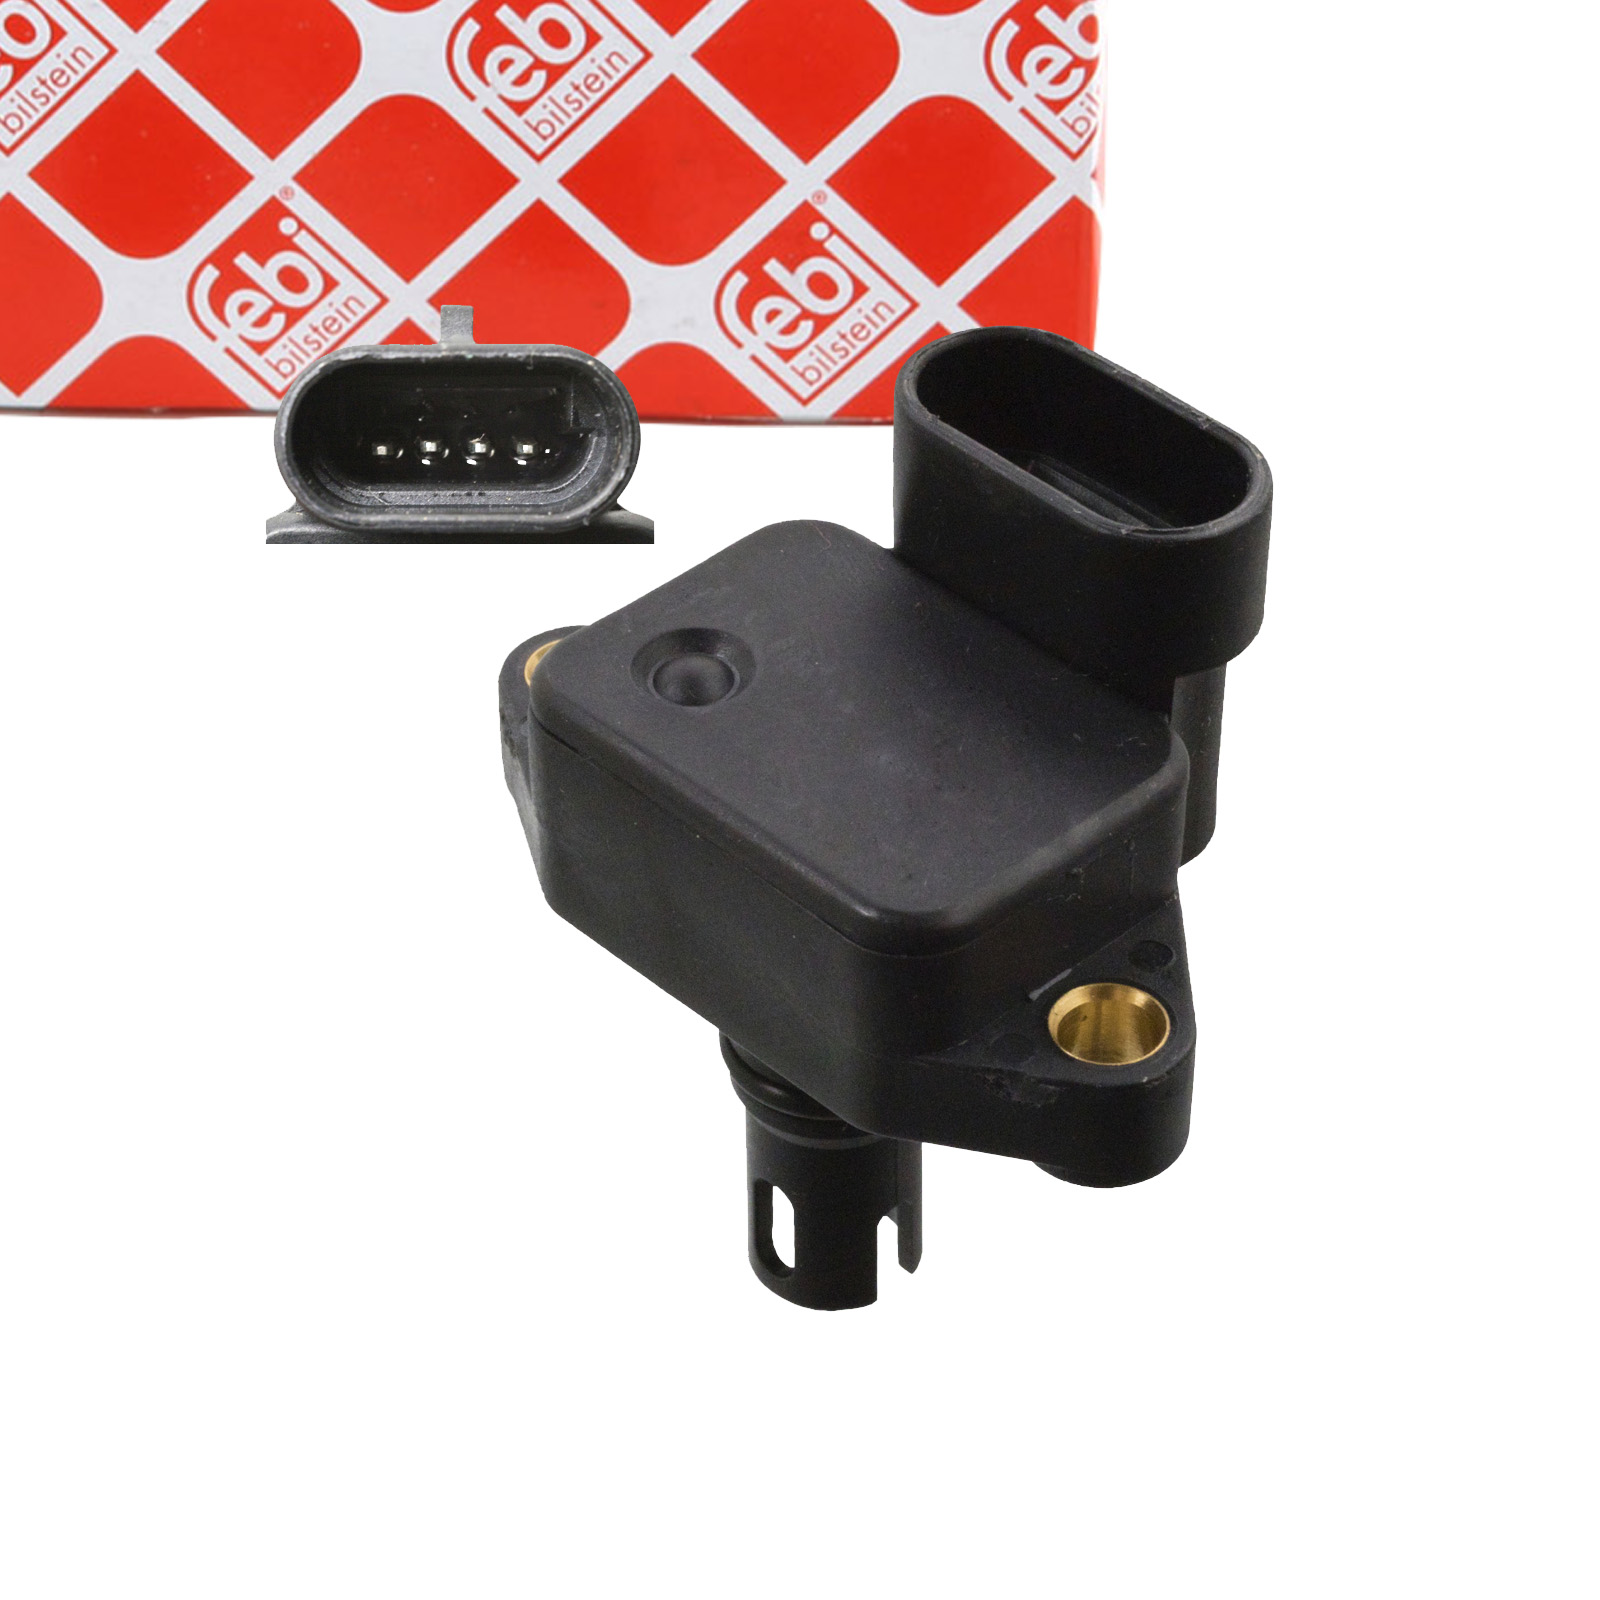 FEBI 105991 Saugrohrdrucksensor Unterdrucksensor MINI R50 R52 R53 ROVER 75 Tourer RJ